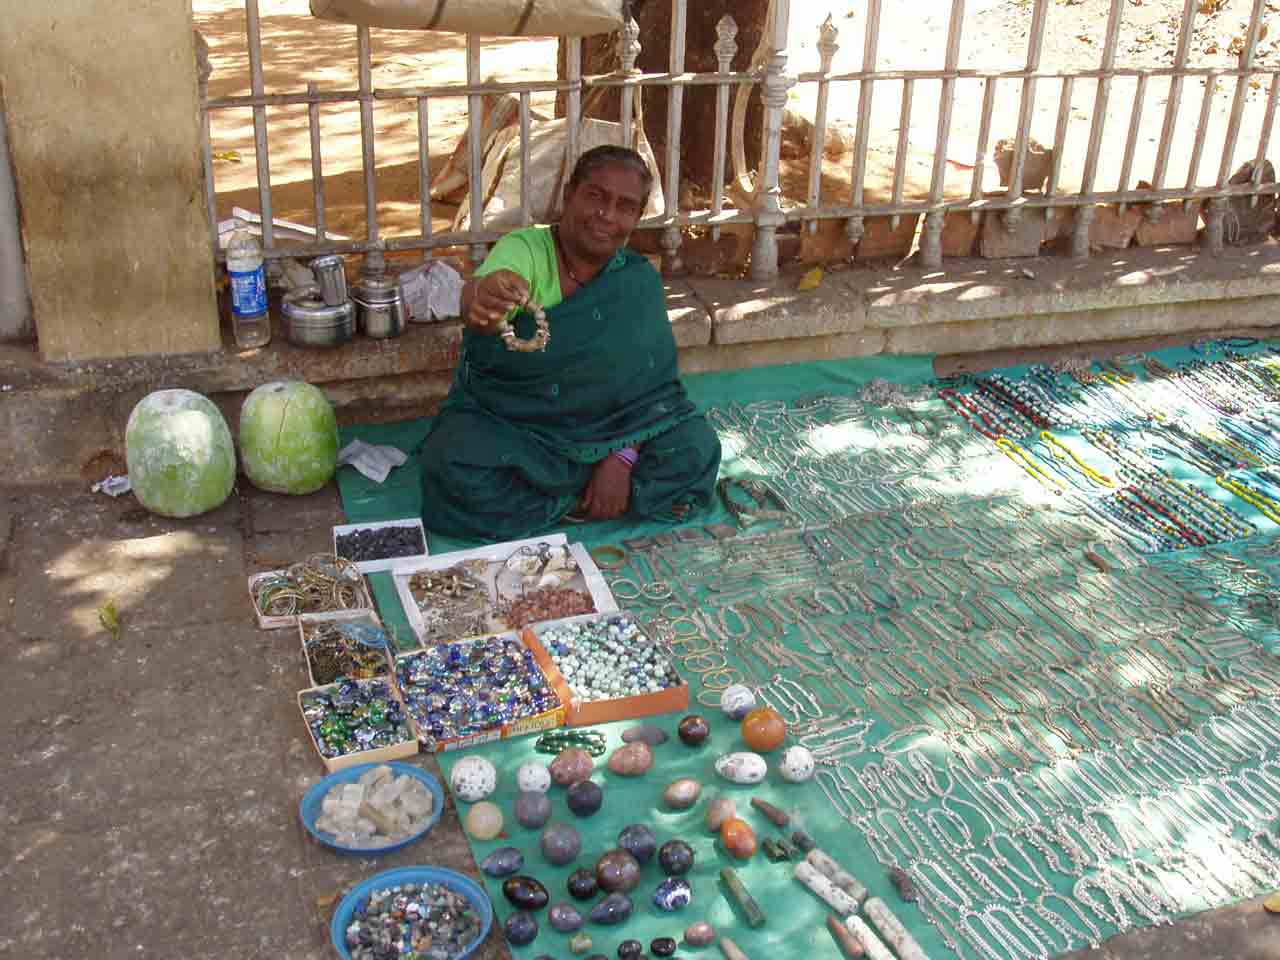 Mysore stall woman